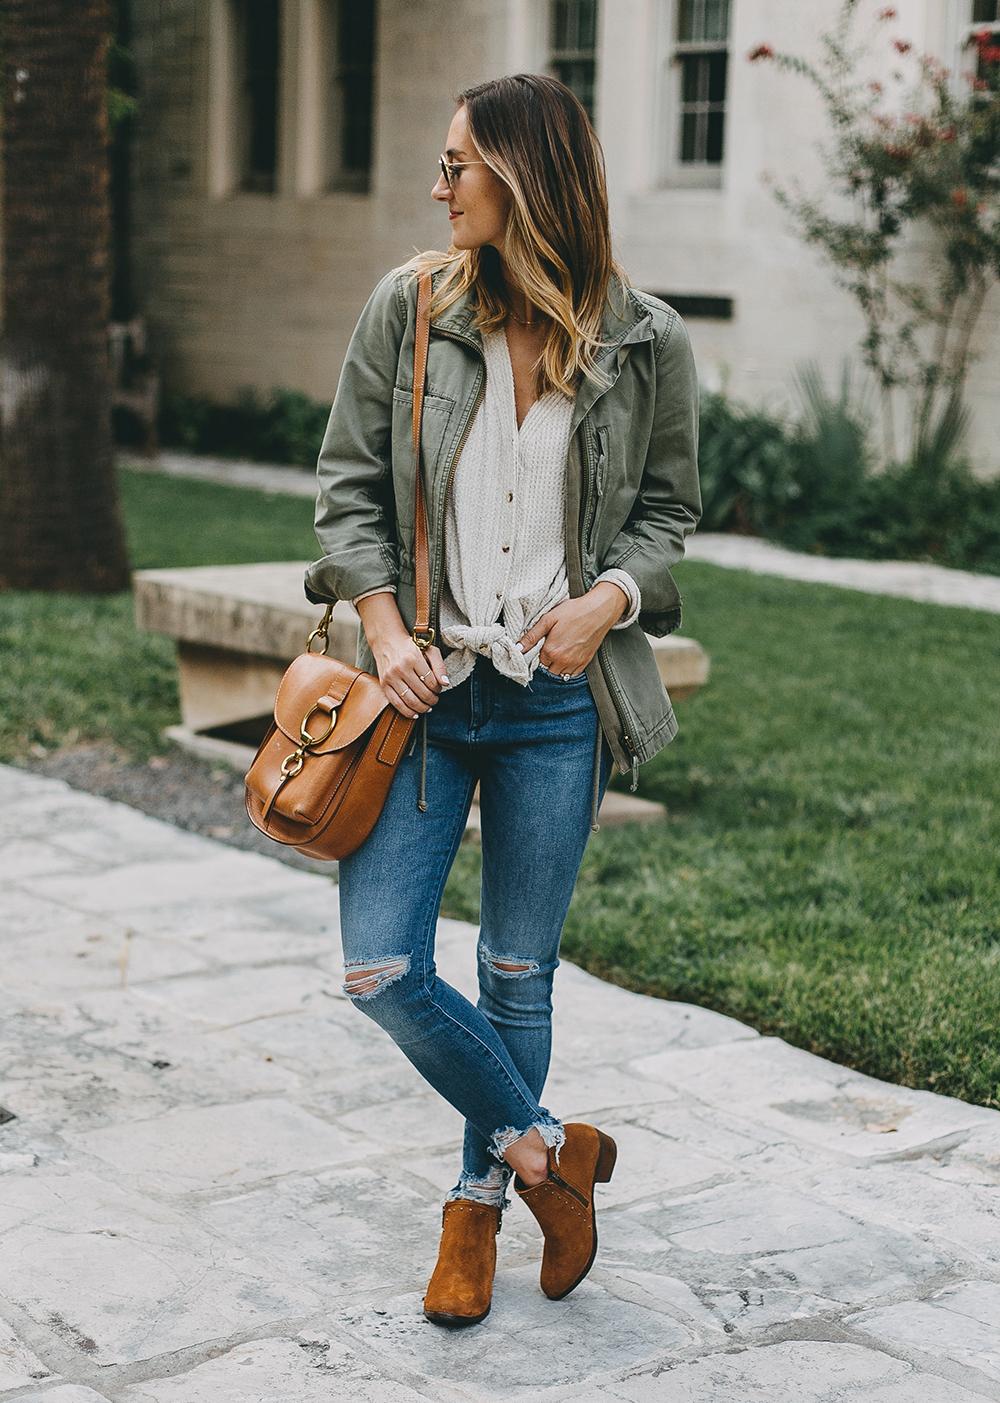 livvyland-blog-olivia-watson-austin-texas-fashion-blogger-minnatonka-moccasins-tan-suede-ankle-booties-madewell-utility-fleet-jacket-15